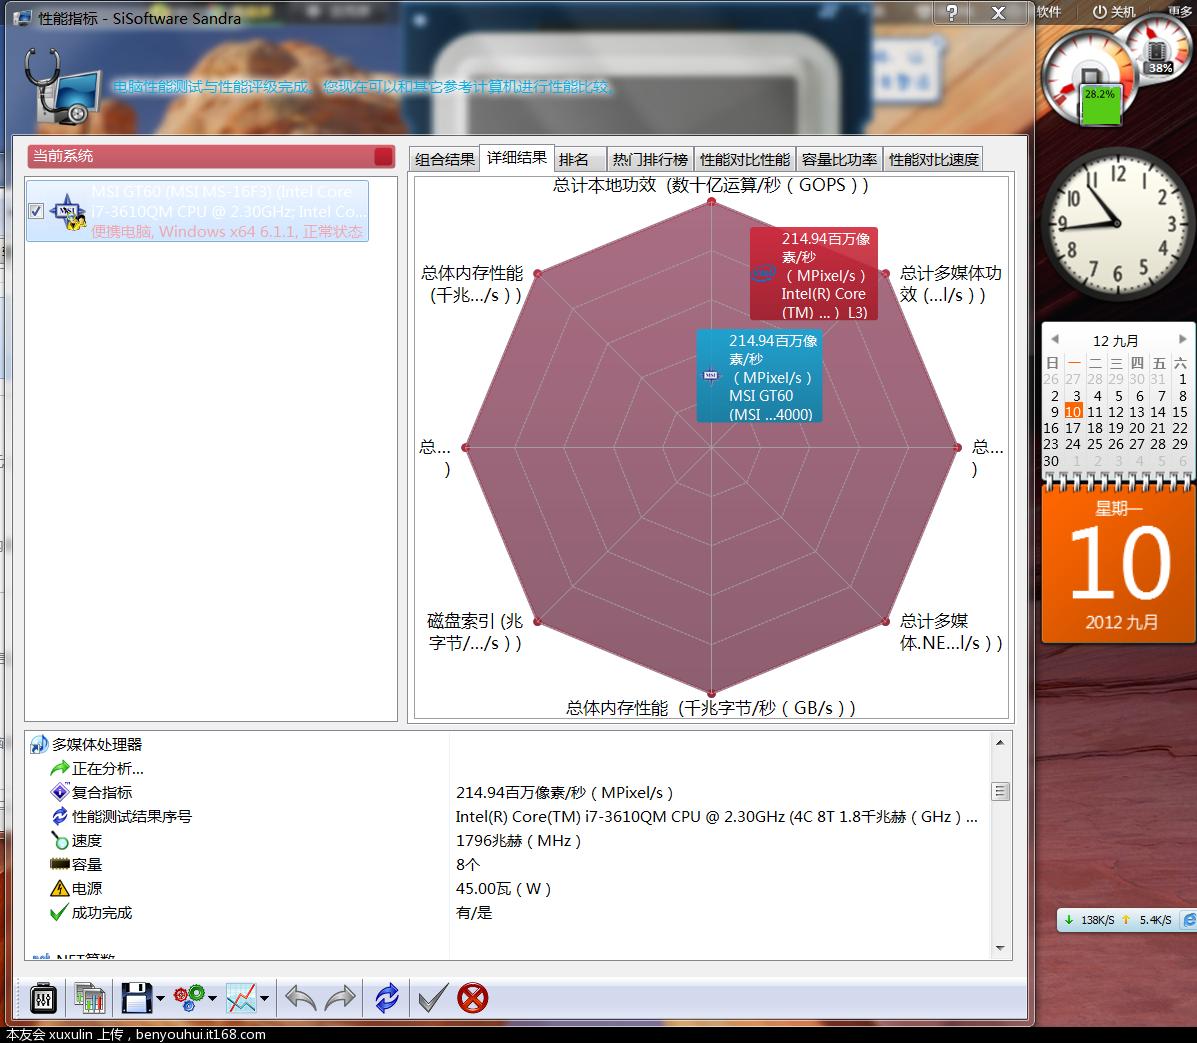 Sisoftware Sandra 截图4.PNG